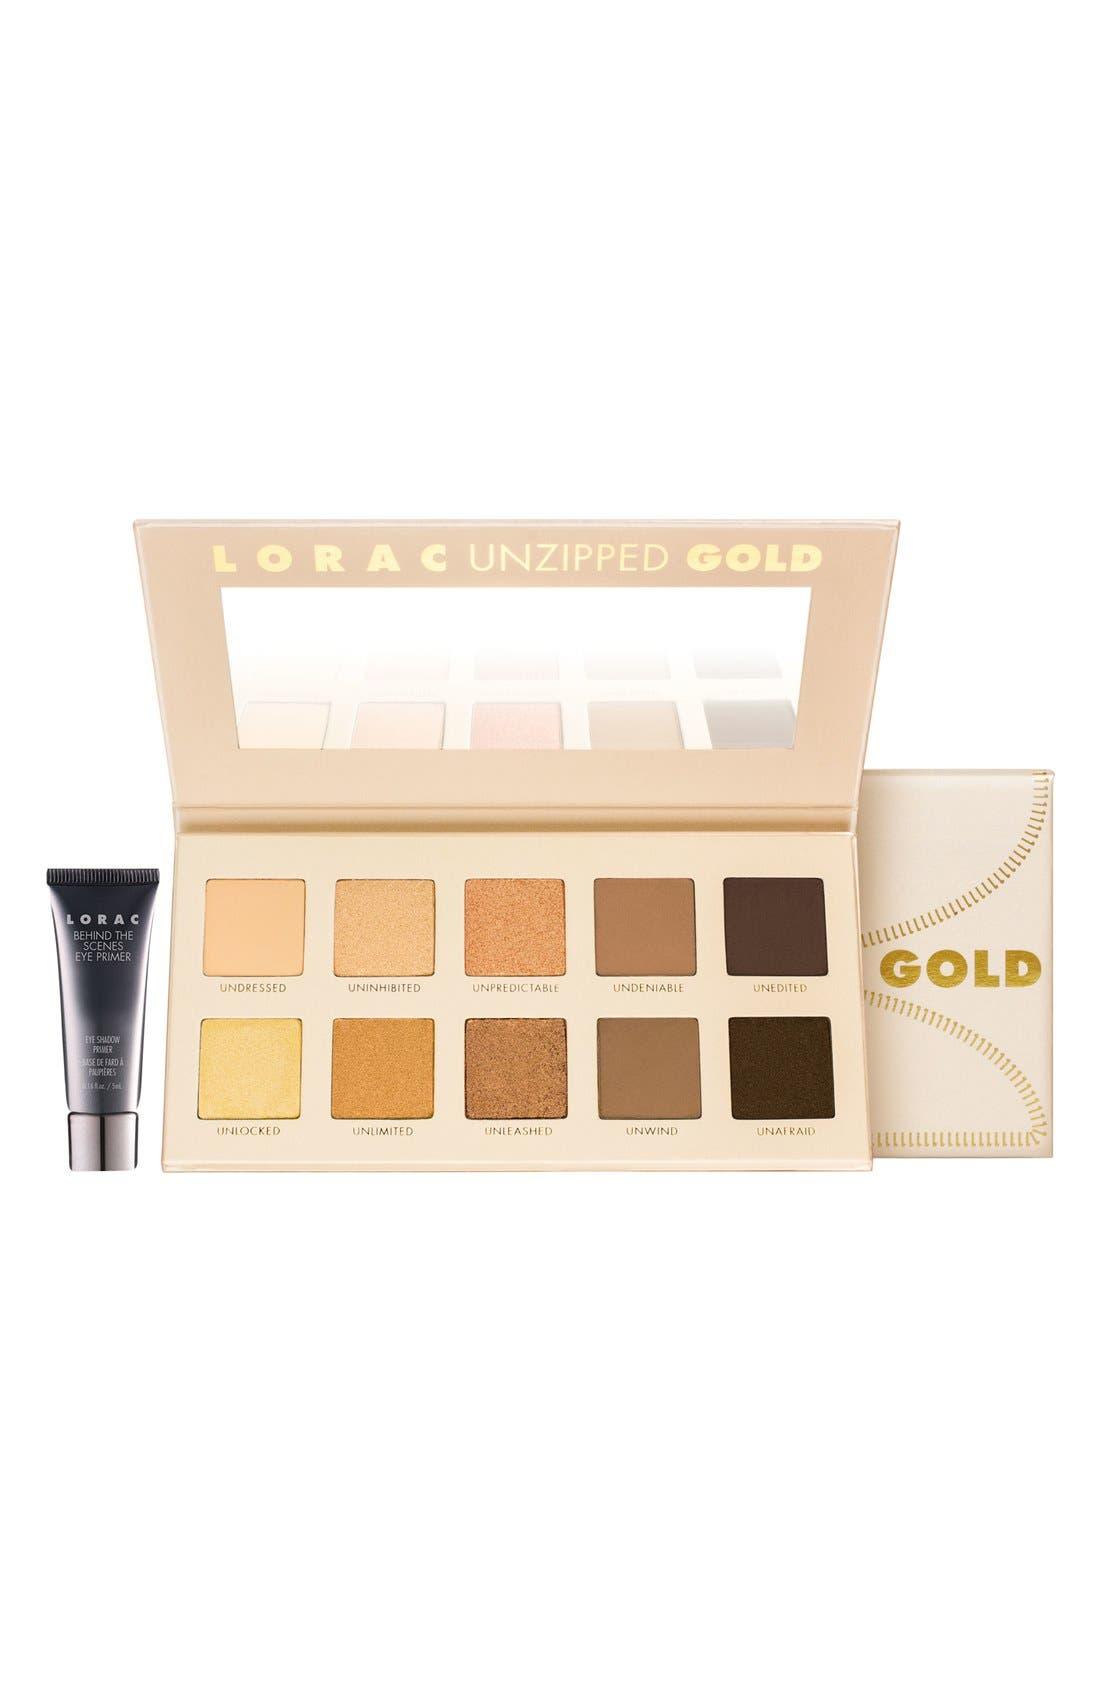 LORAC 'Unzipped Gold' Eyeshadow Palette ($200 Value)